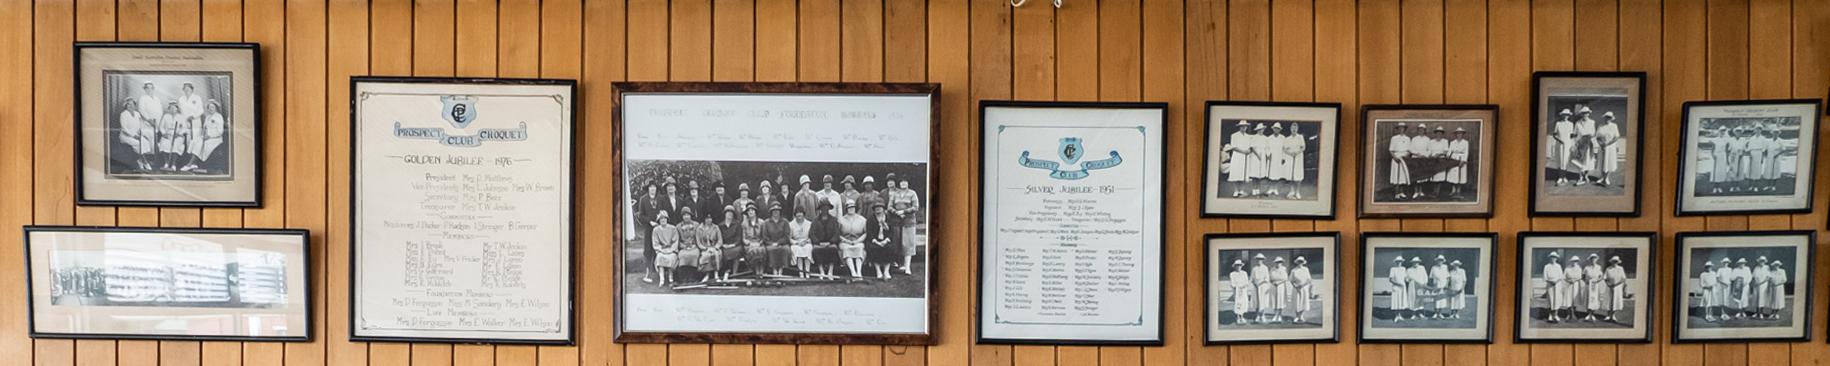 NACC North Adelaide Croquet Club History